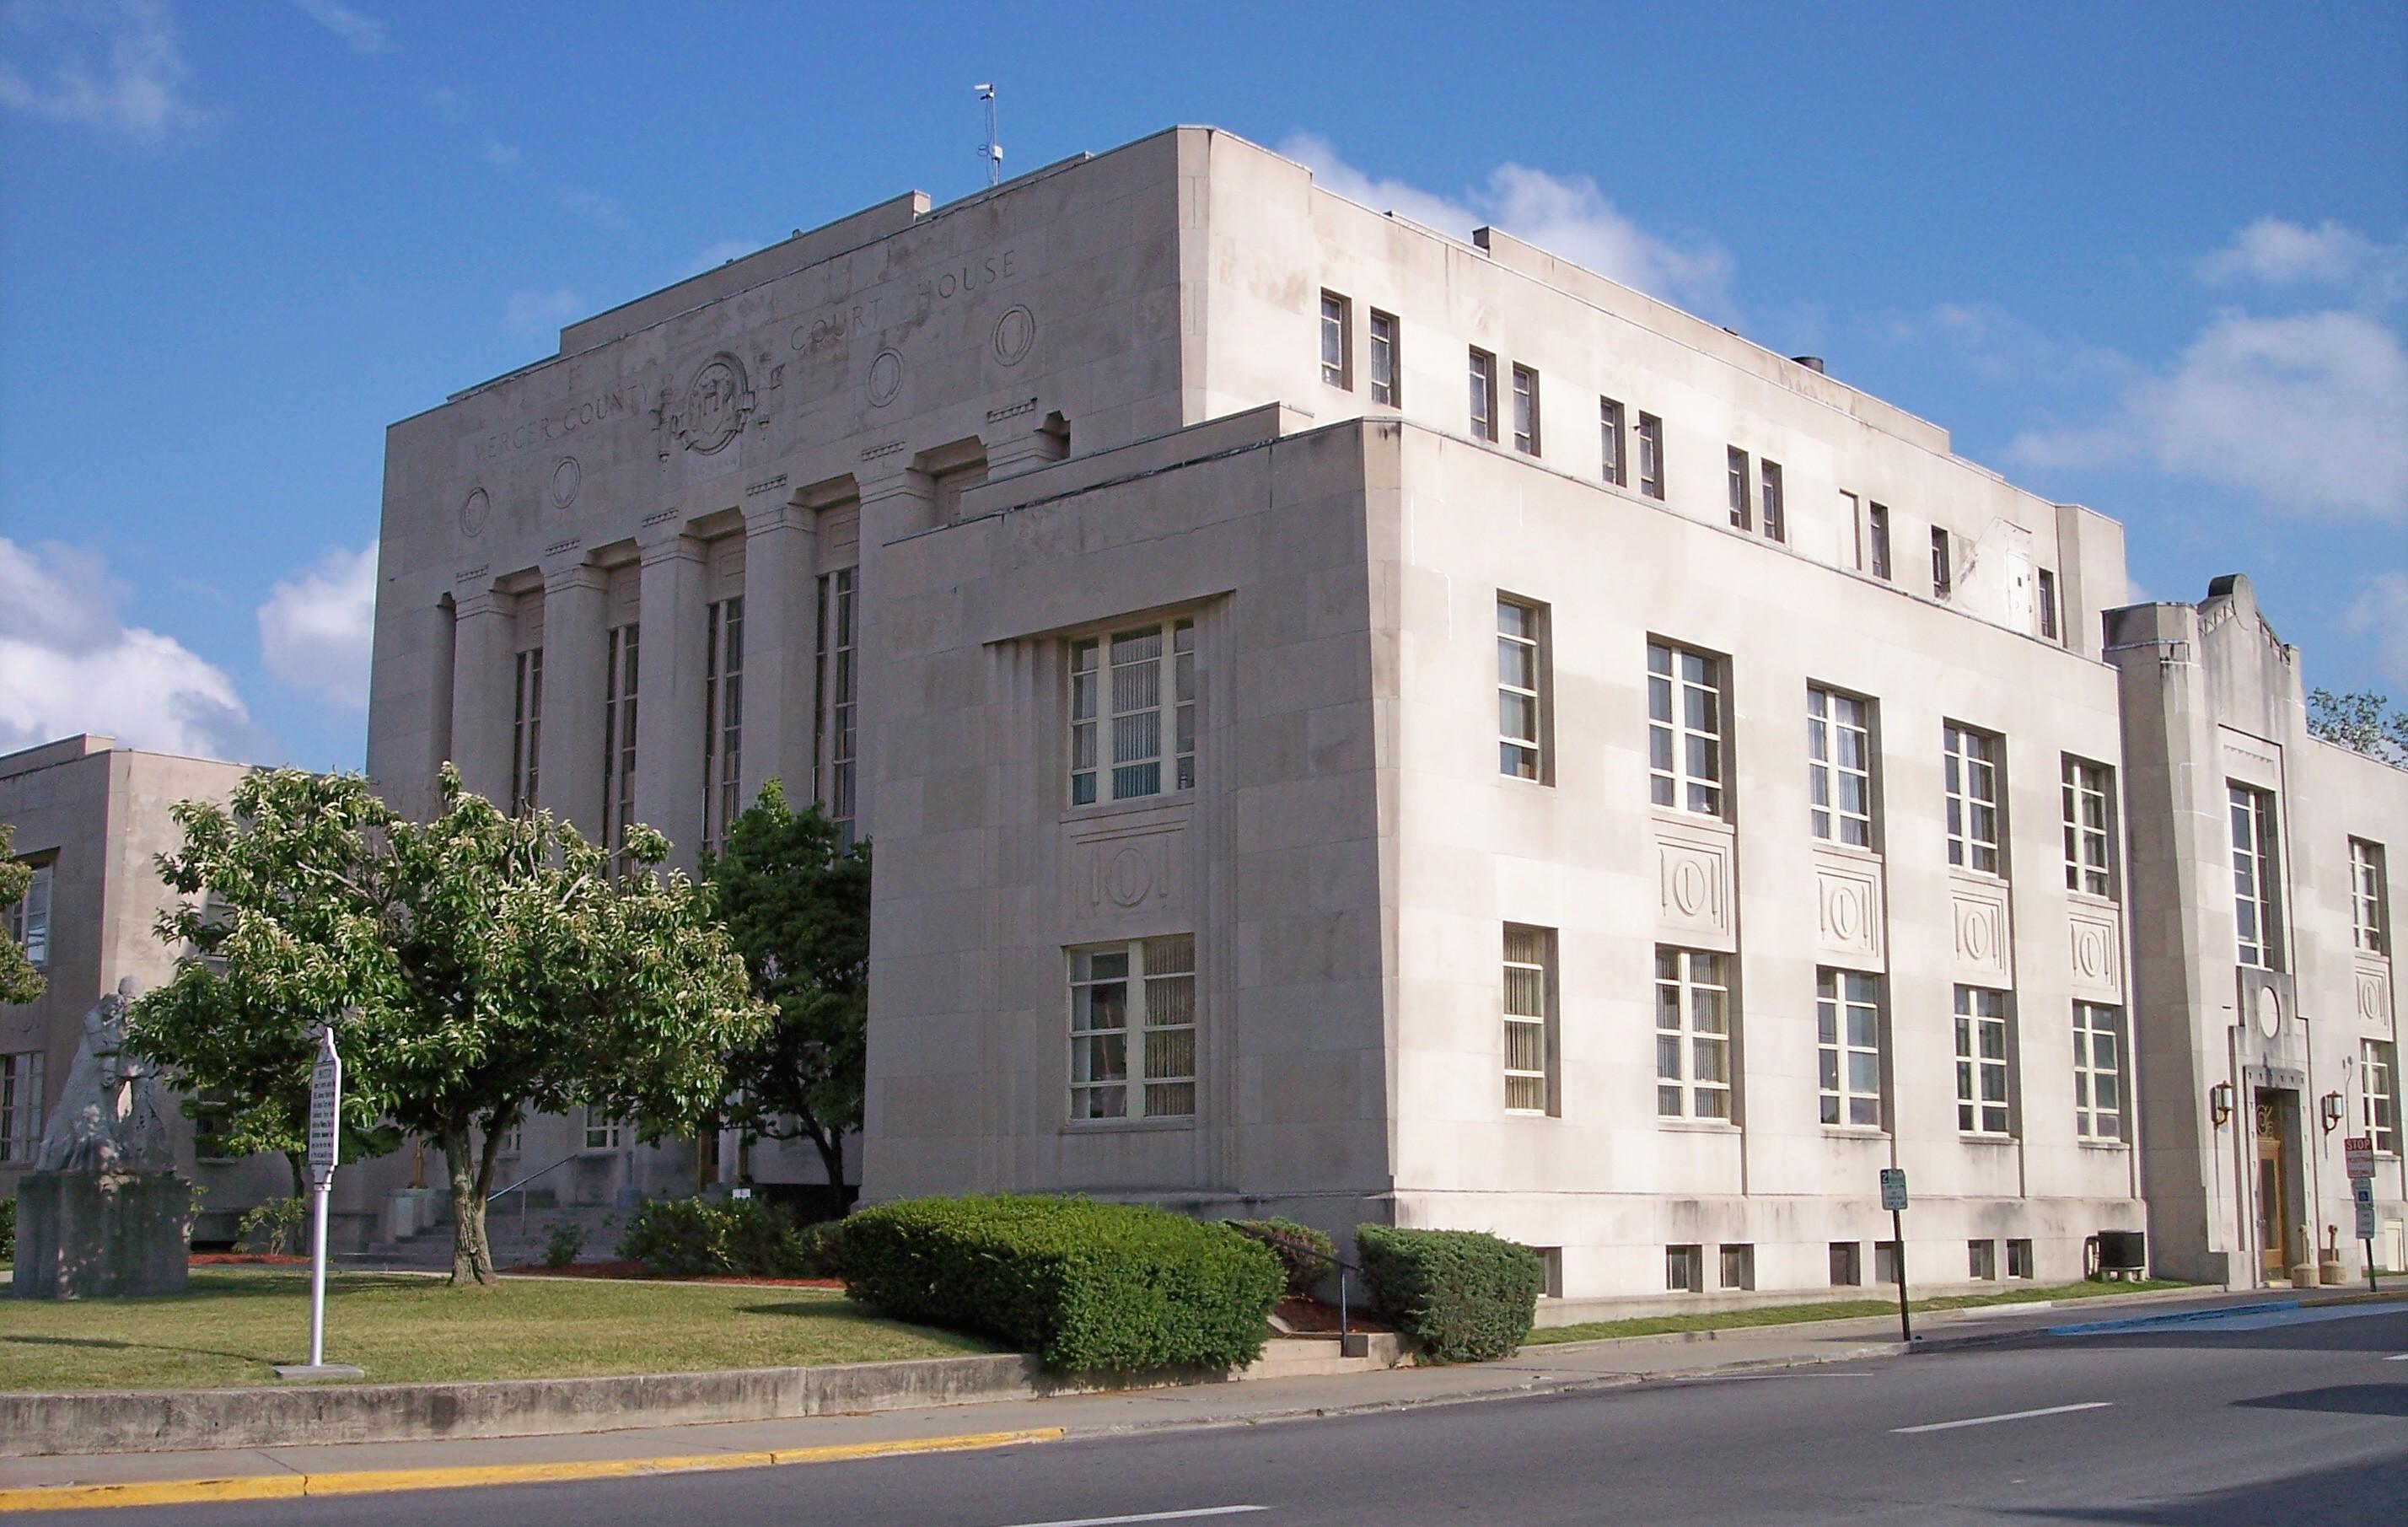 Courthouse Virginia Courthouse West Virginia